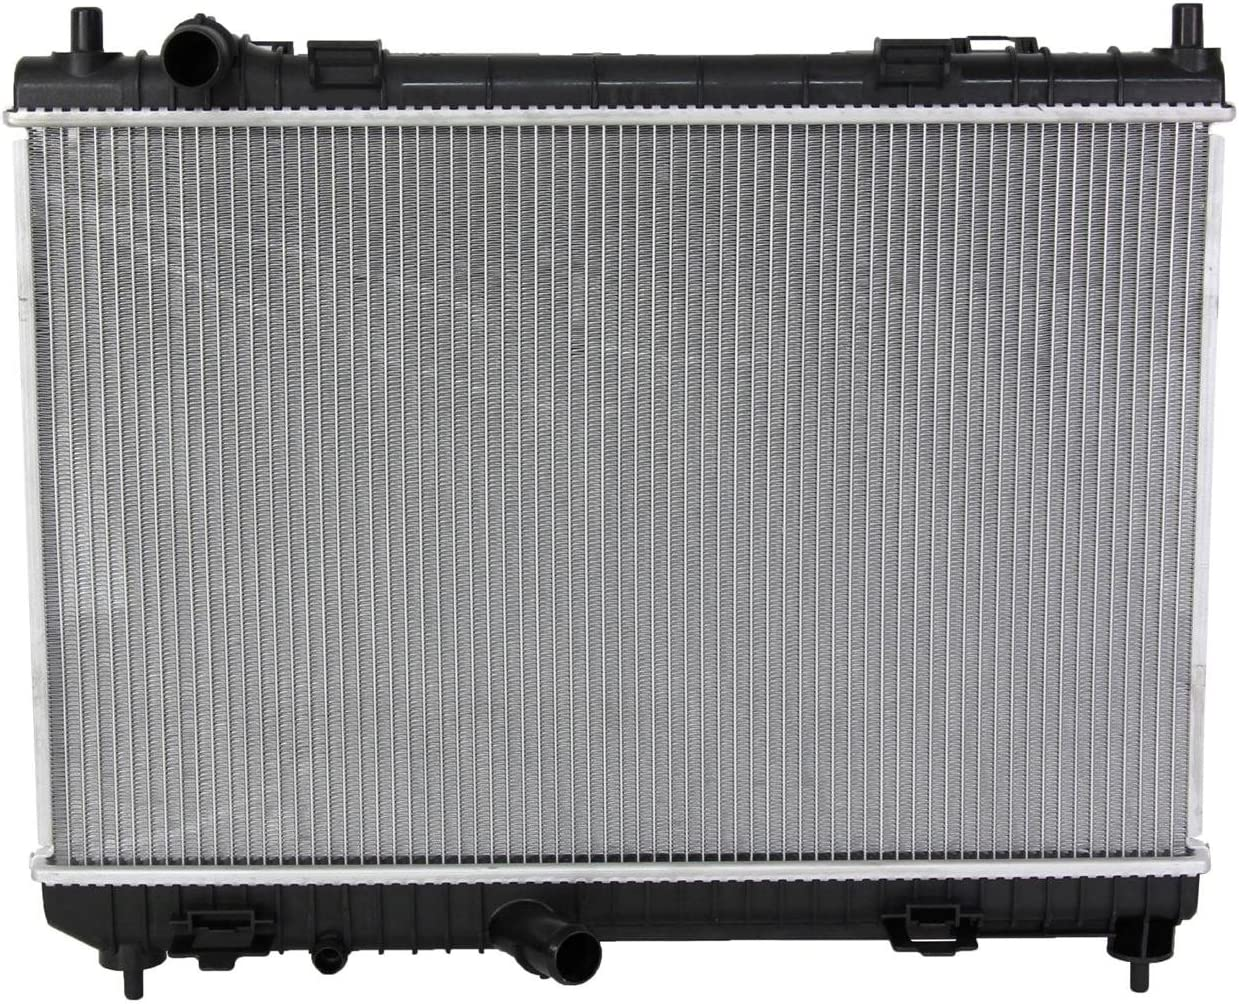 New Radiator Assembly AE8Z8005B FO3010296